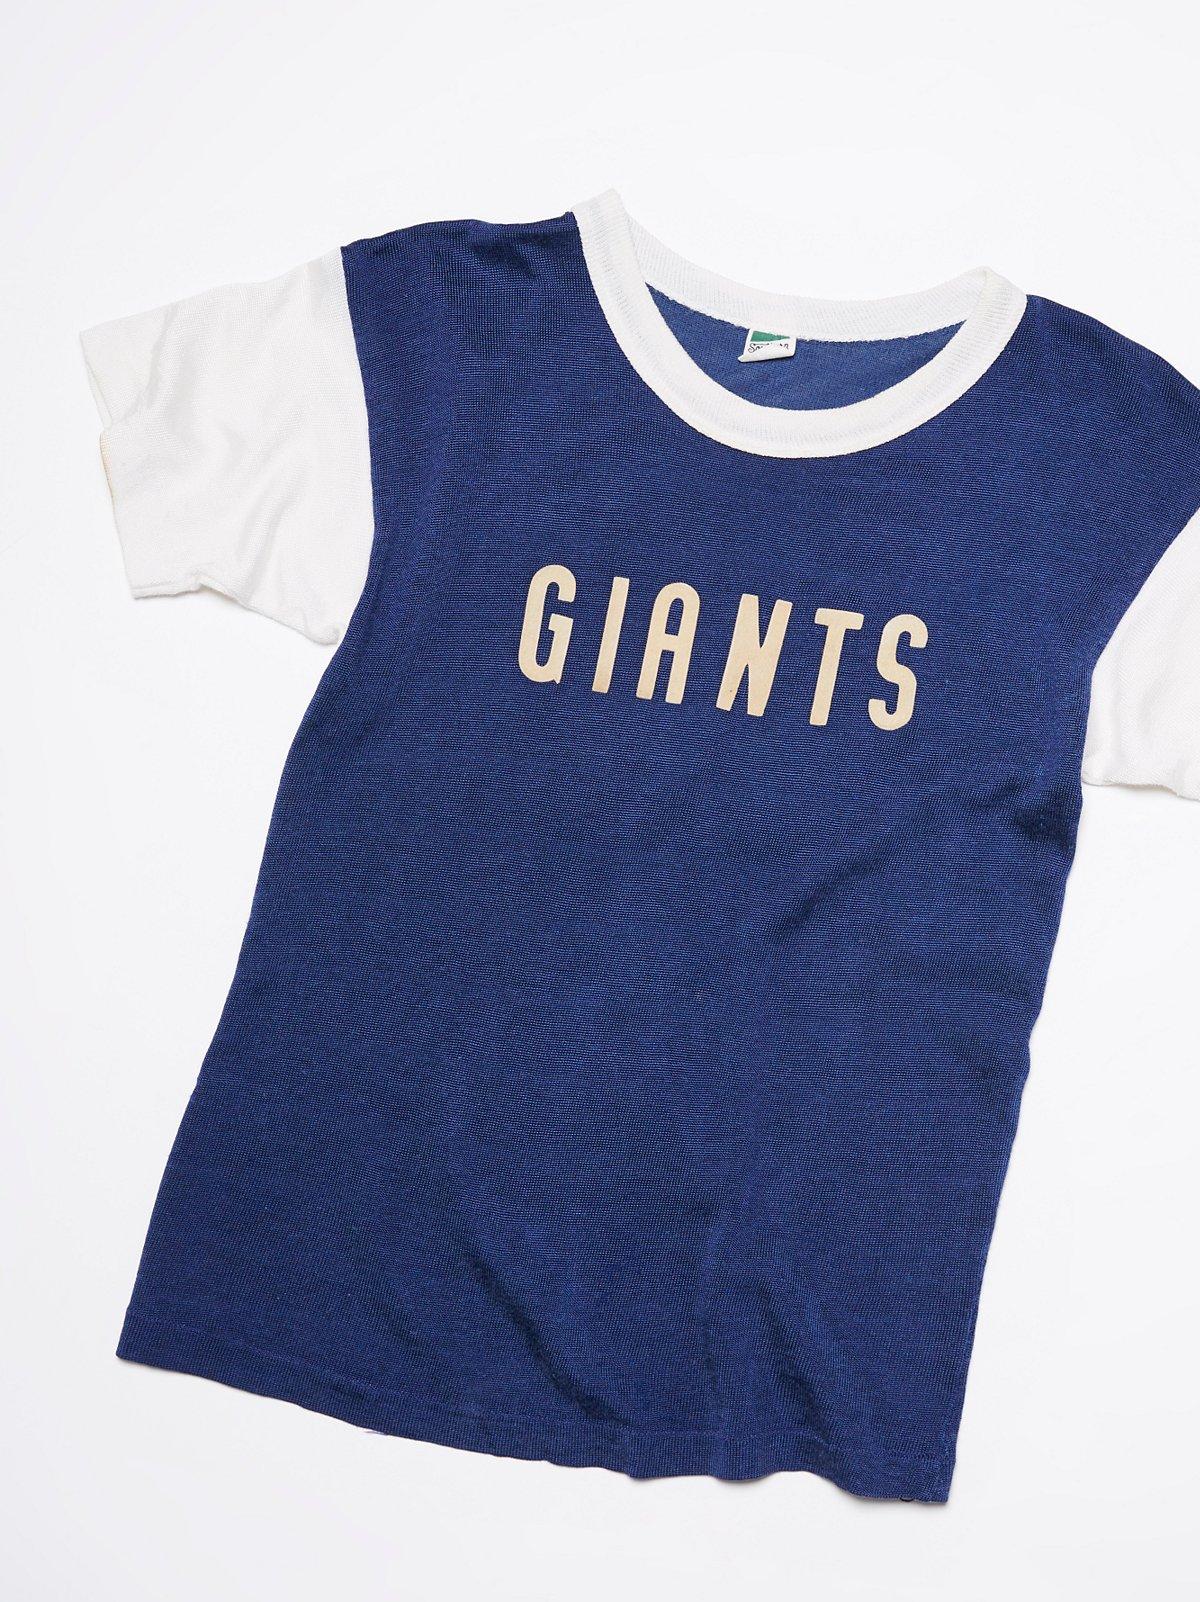 Vintage 1950s Giants Jersey